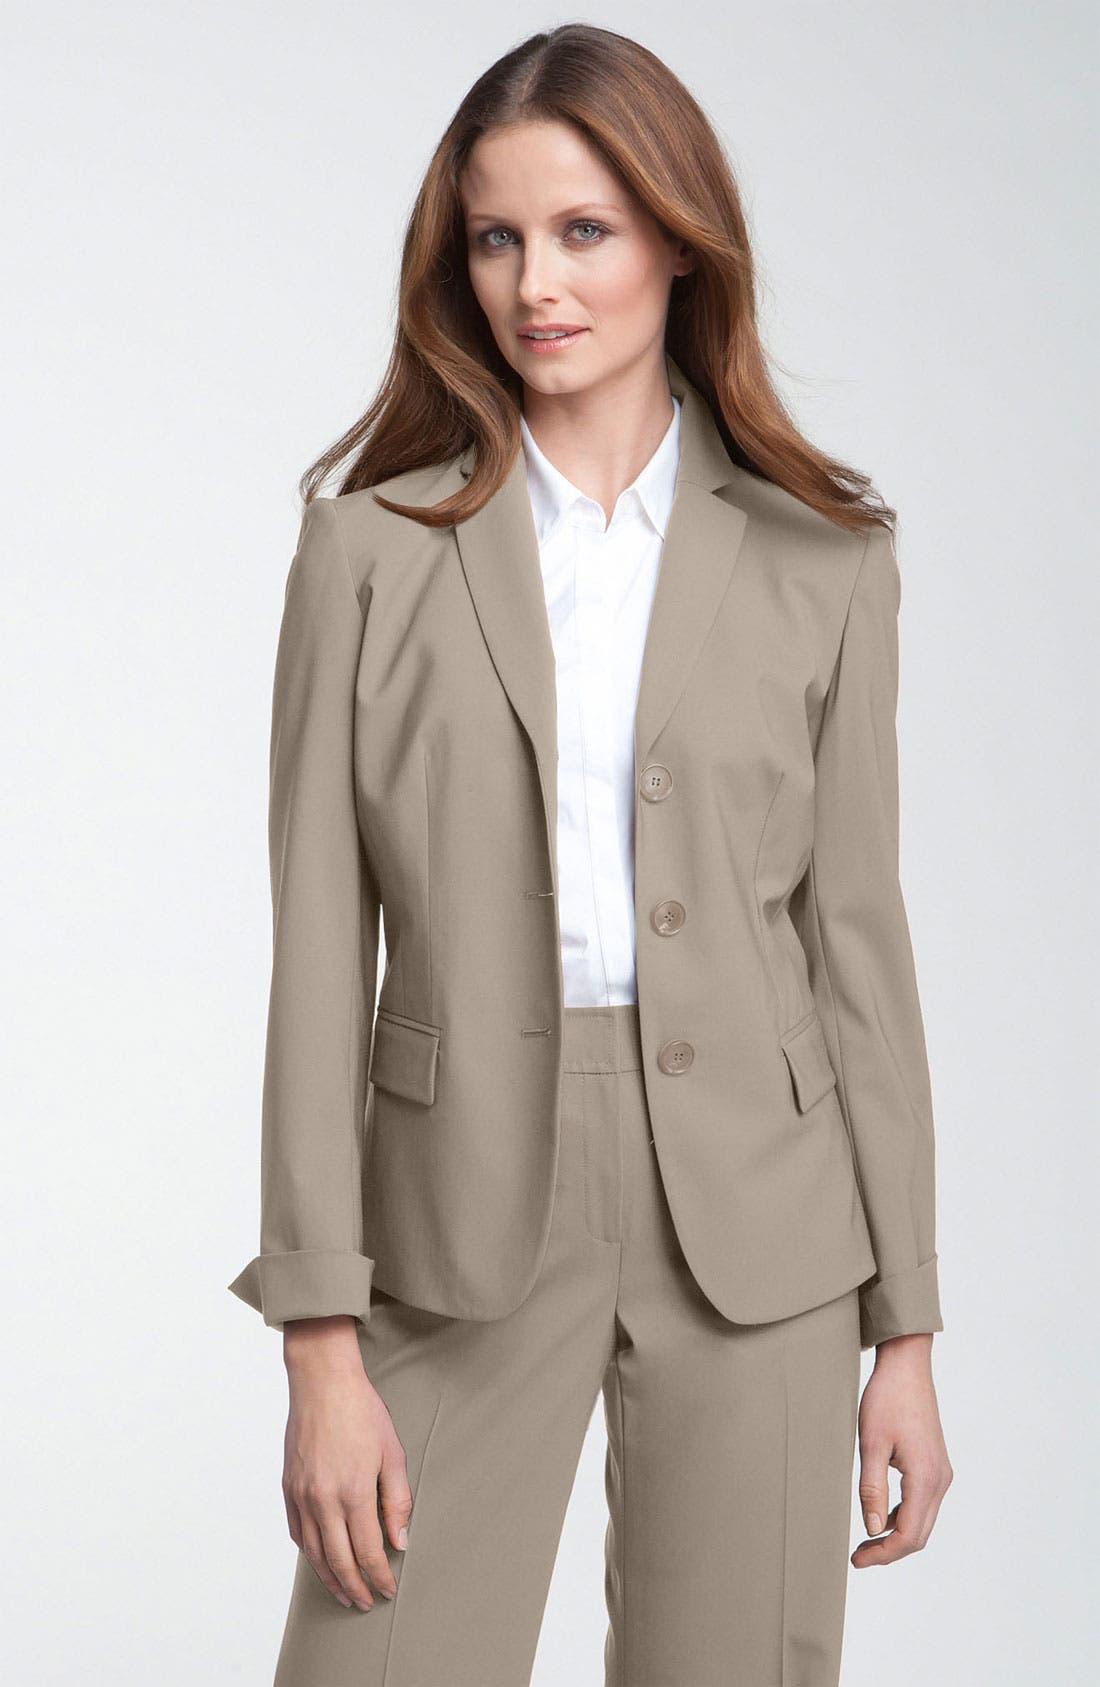 Alternate Image 1 Selected - Lafayette 148 New York 'Hayes' Stretch Wool Jacket